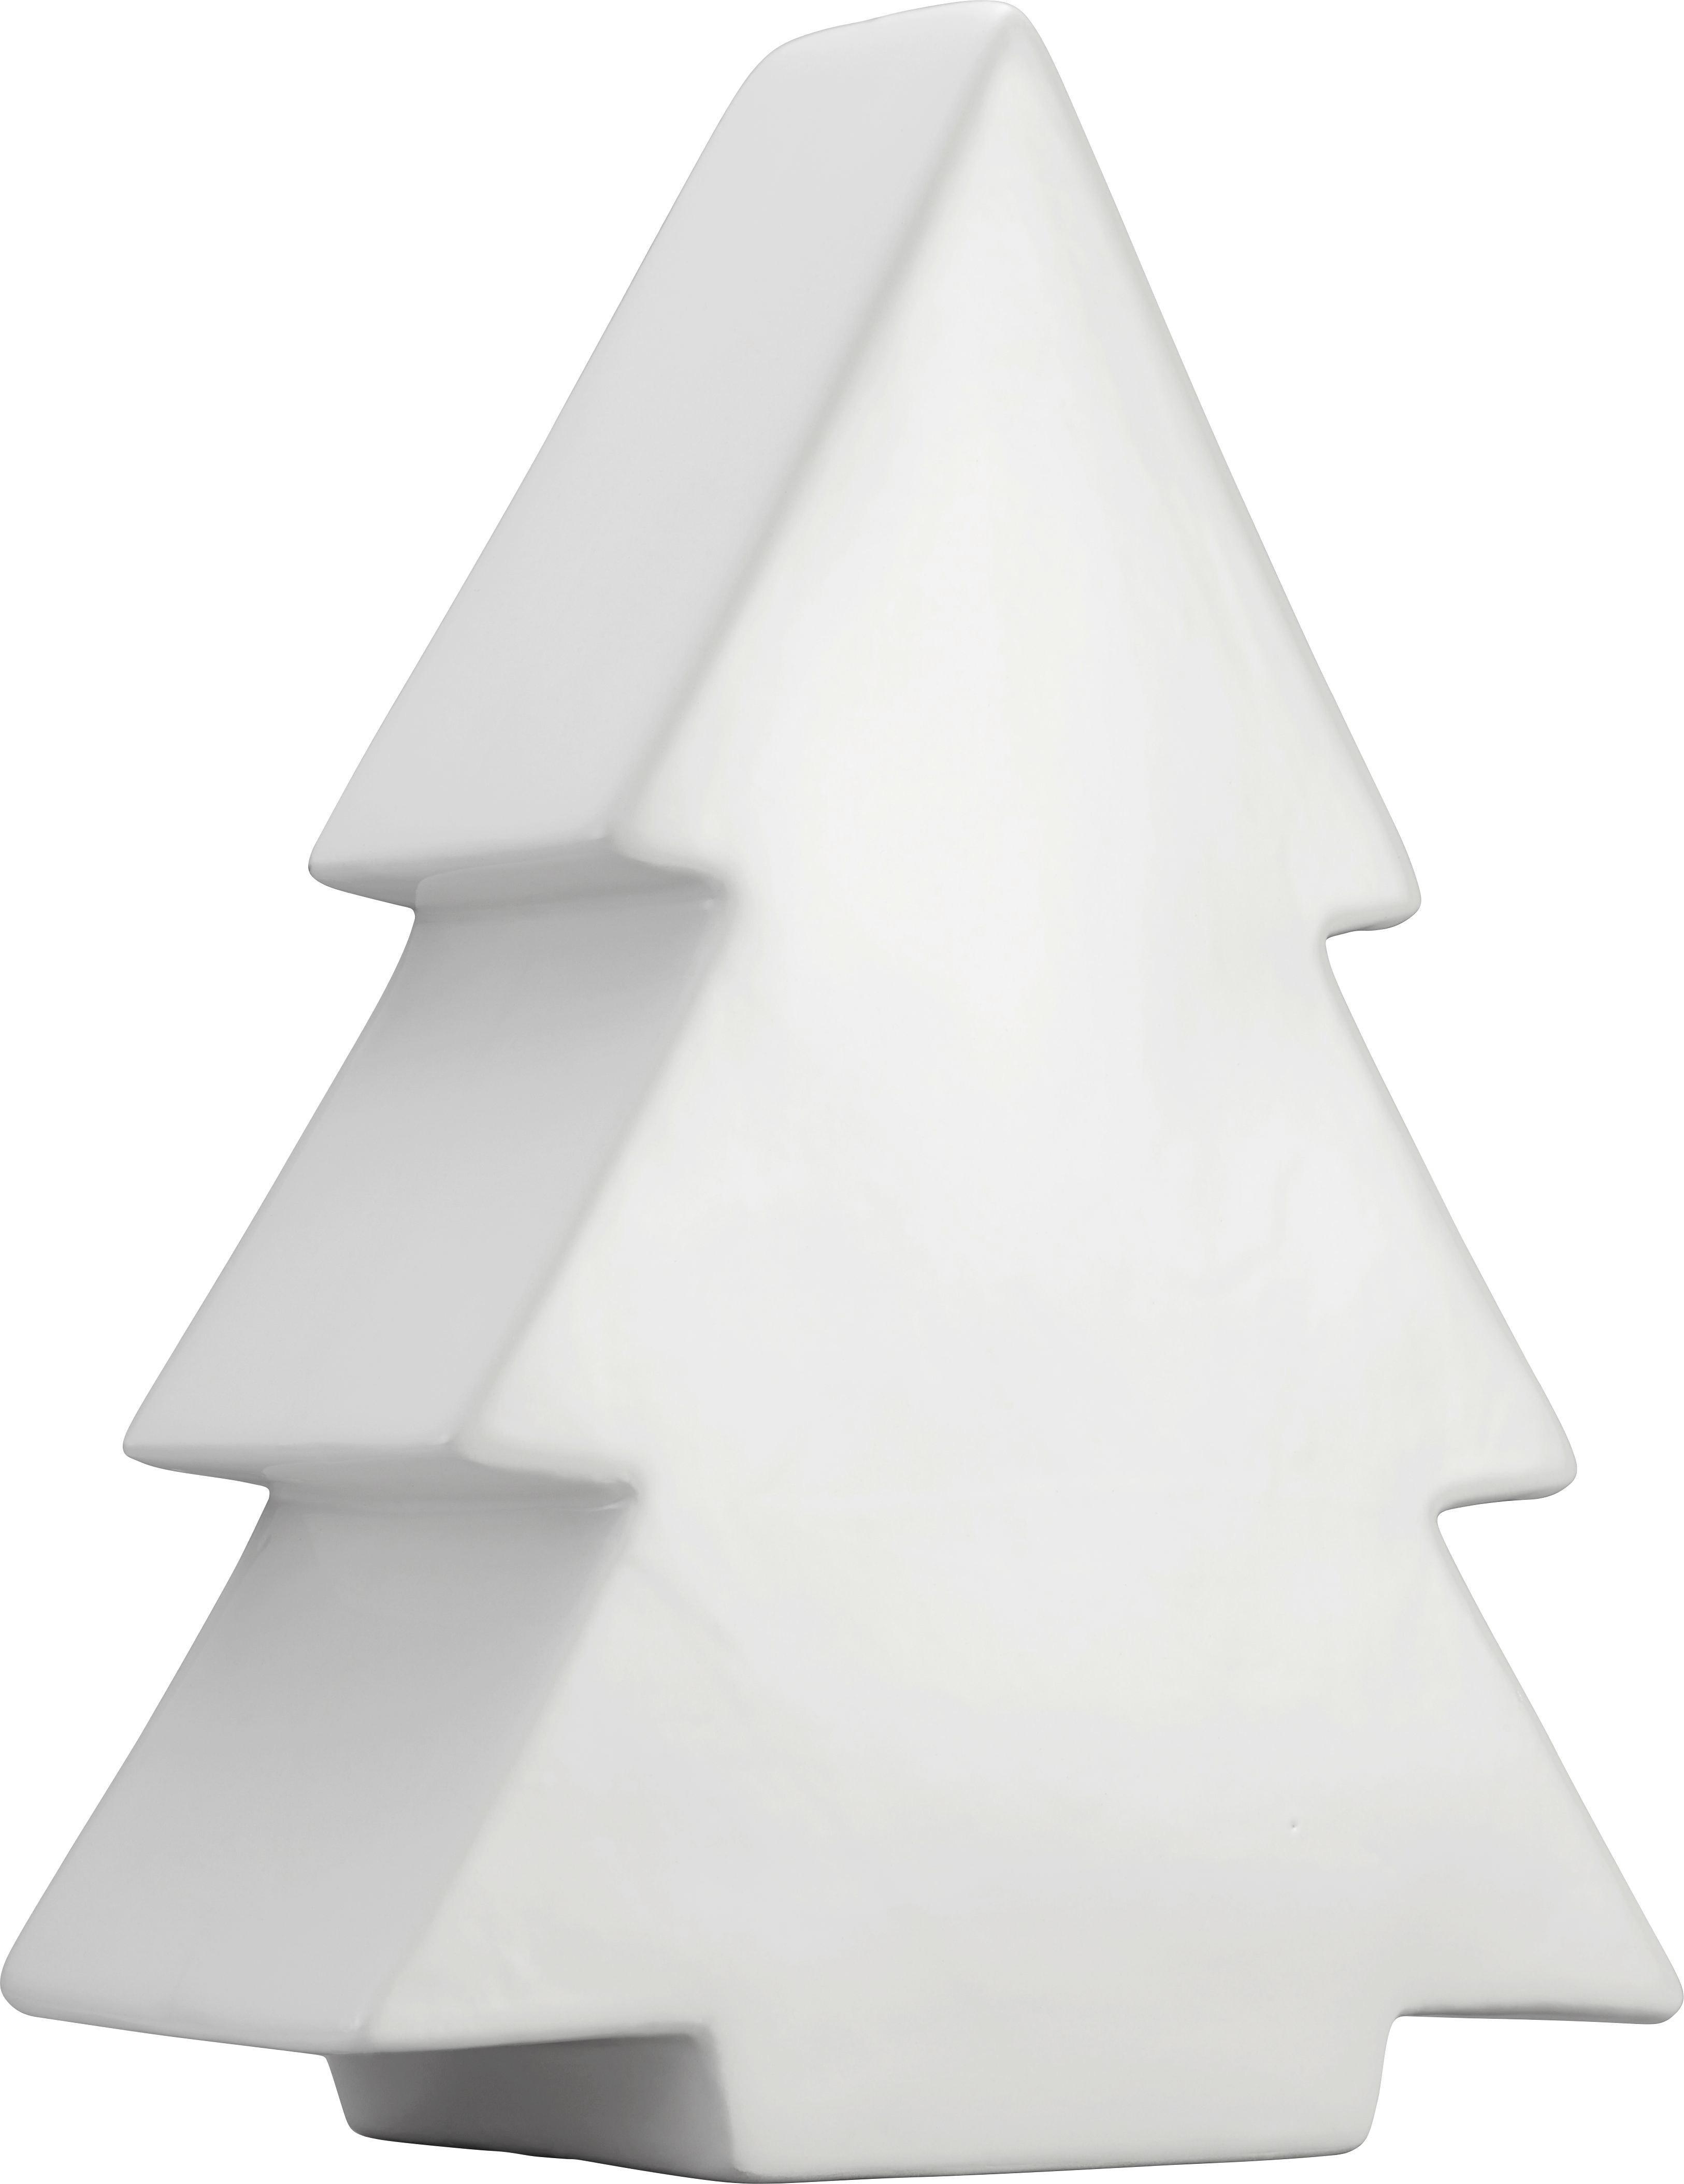 Dekor Fa Luise - fehér, kerámia (7,5/4,3/16cm) - MÖMAX modern living